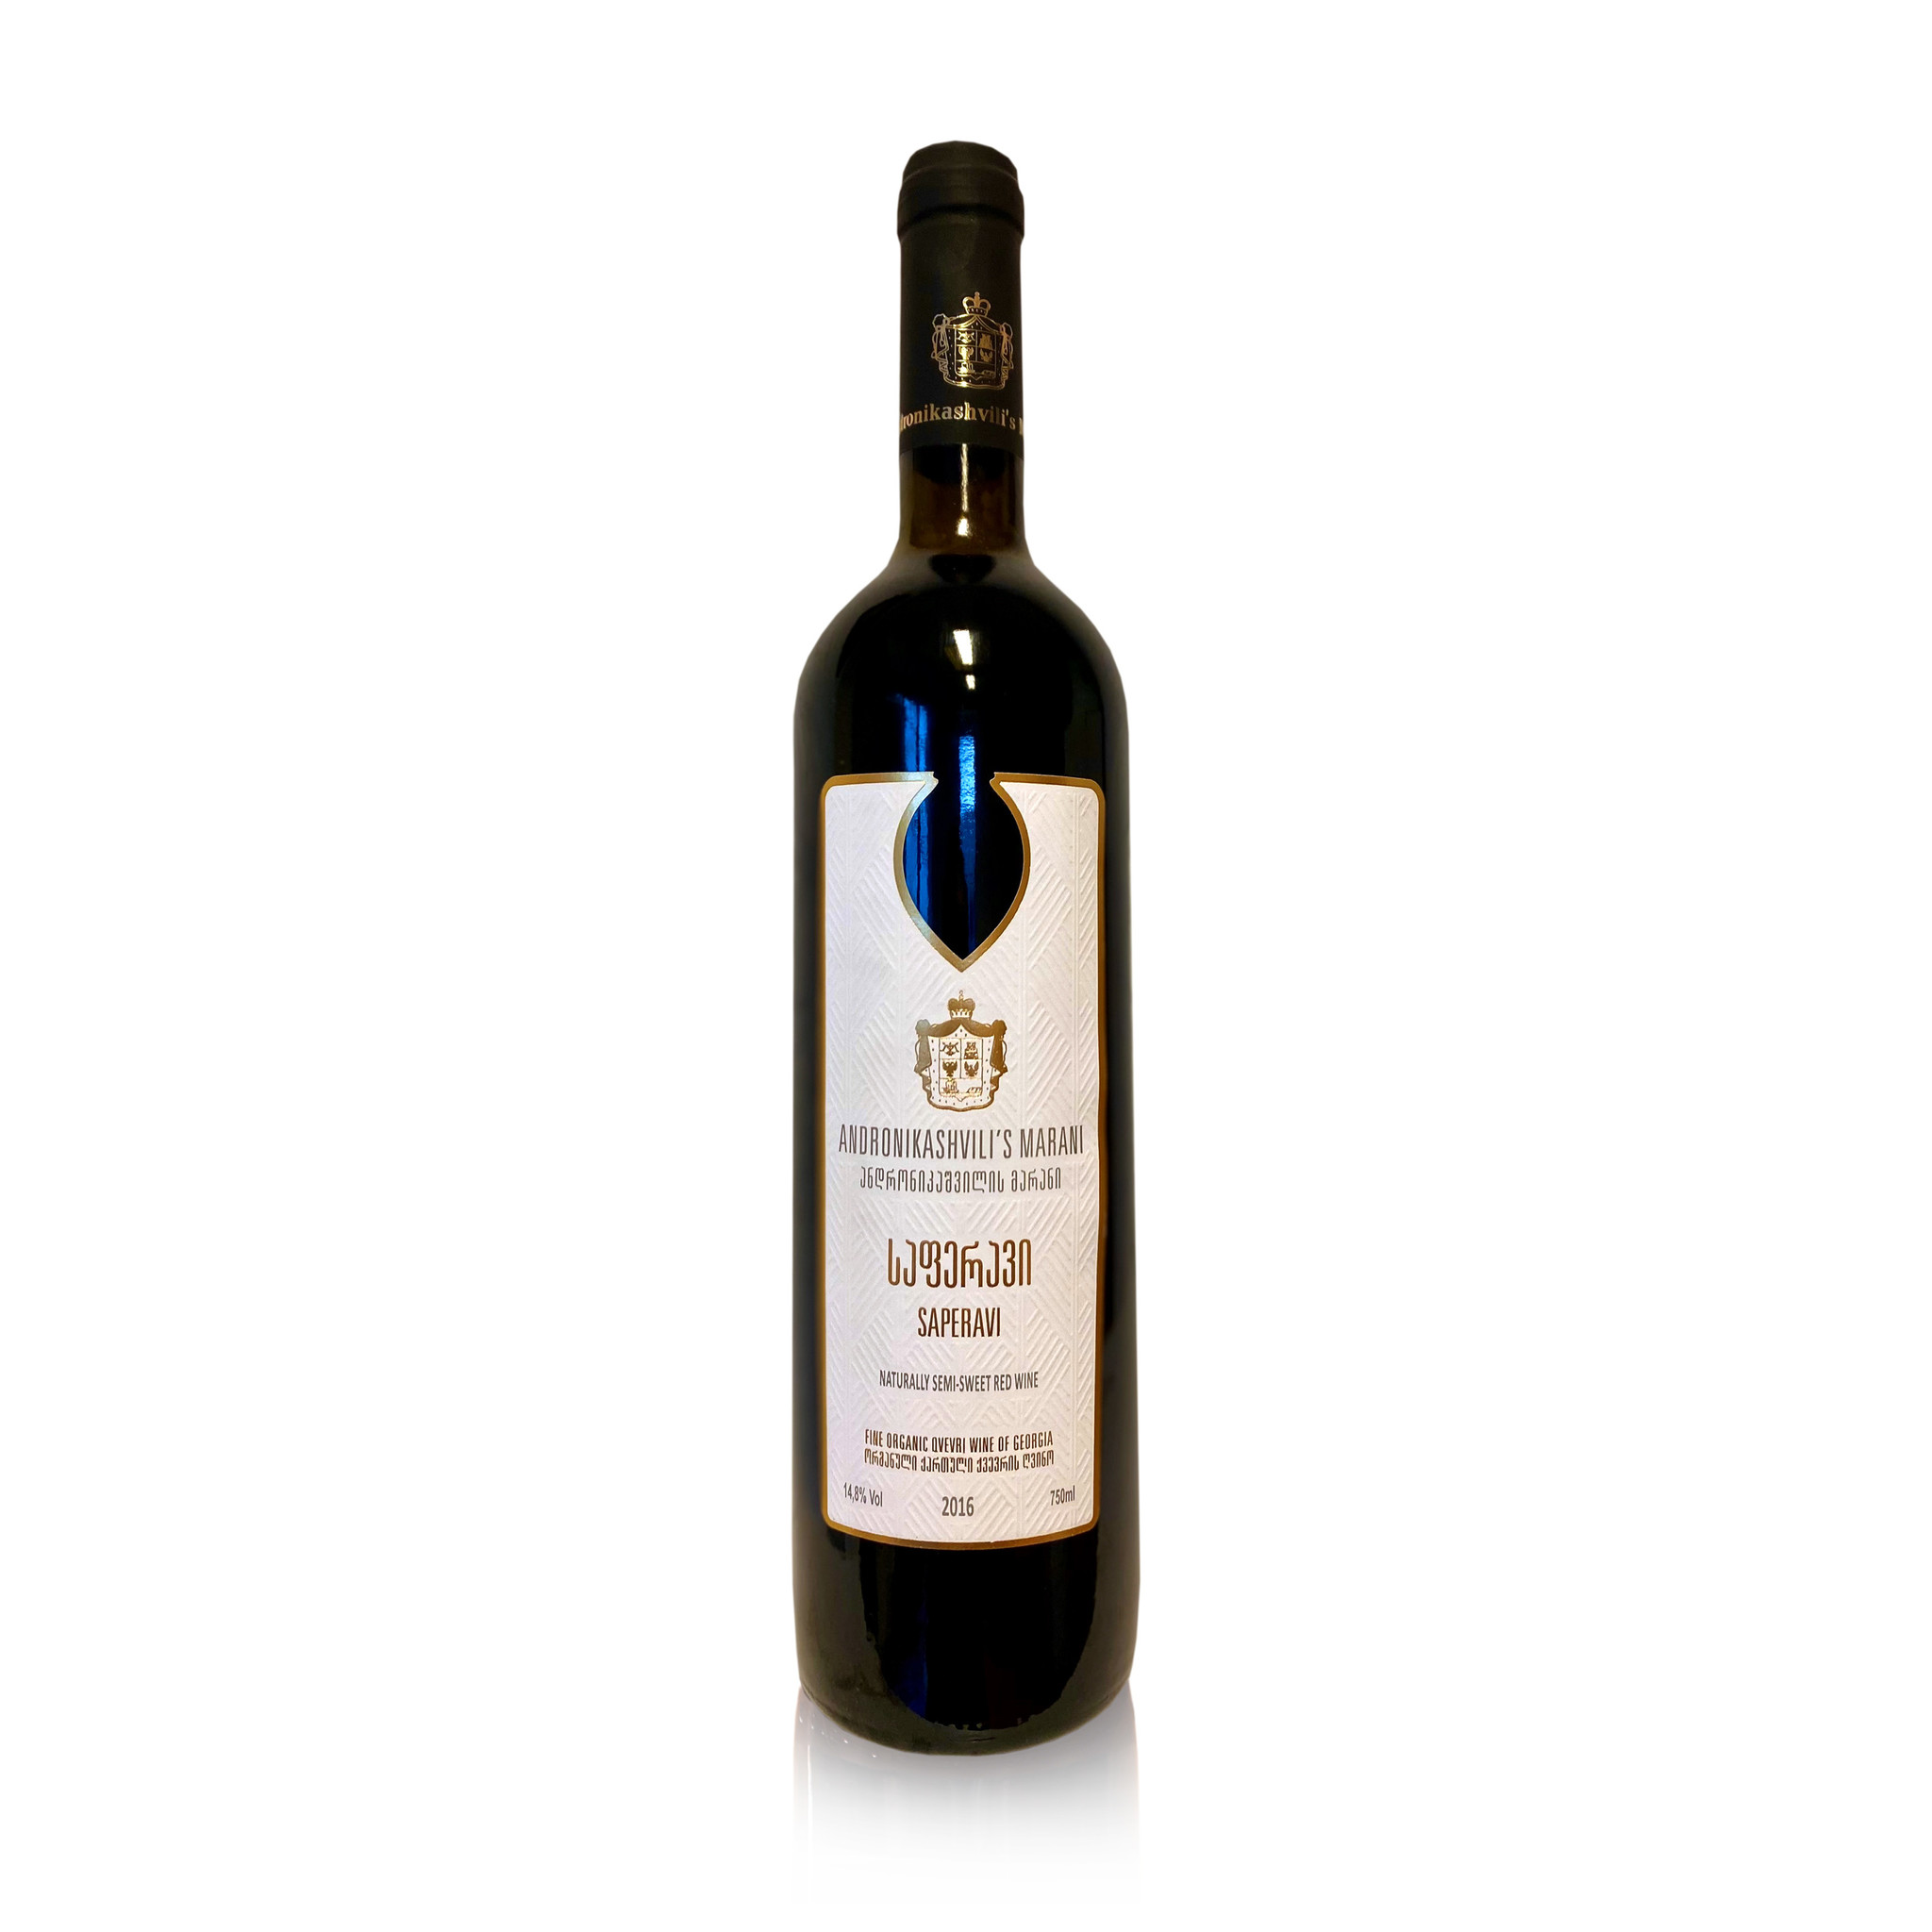 Andronikashvili Bio winery Saperavi Andronikashvili Bio winery 2016 halfzoet-rode wijn